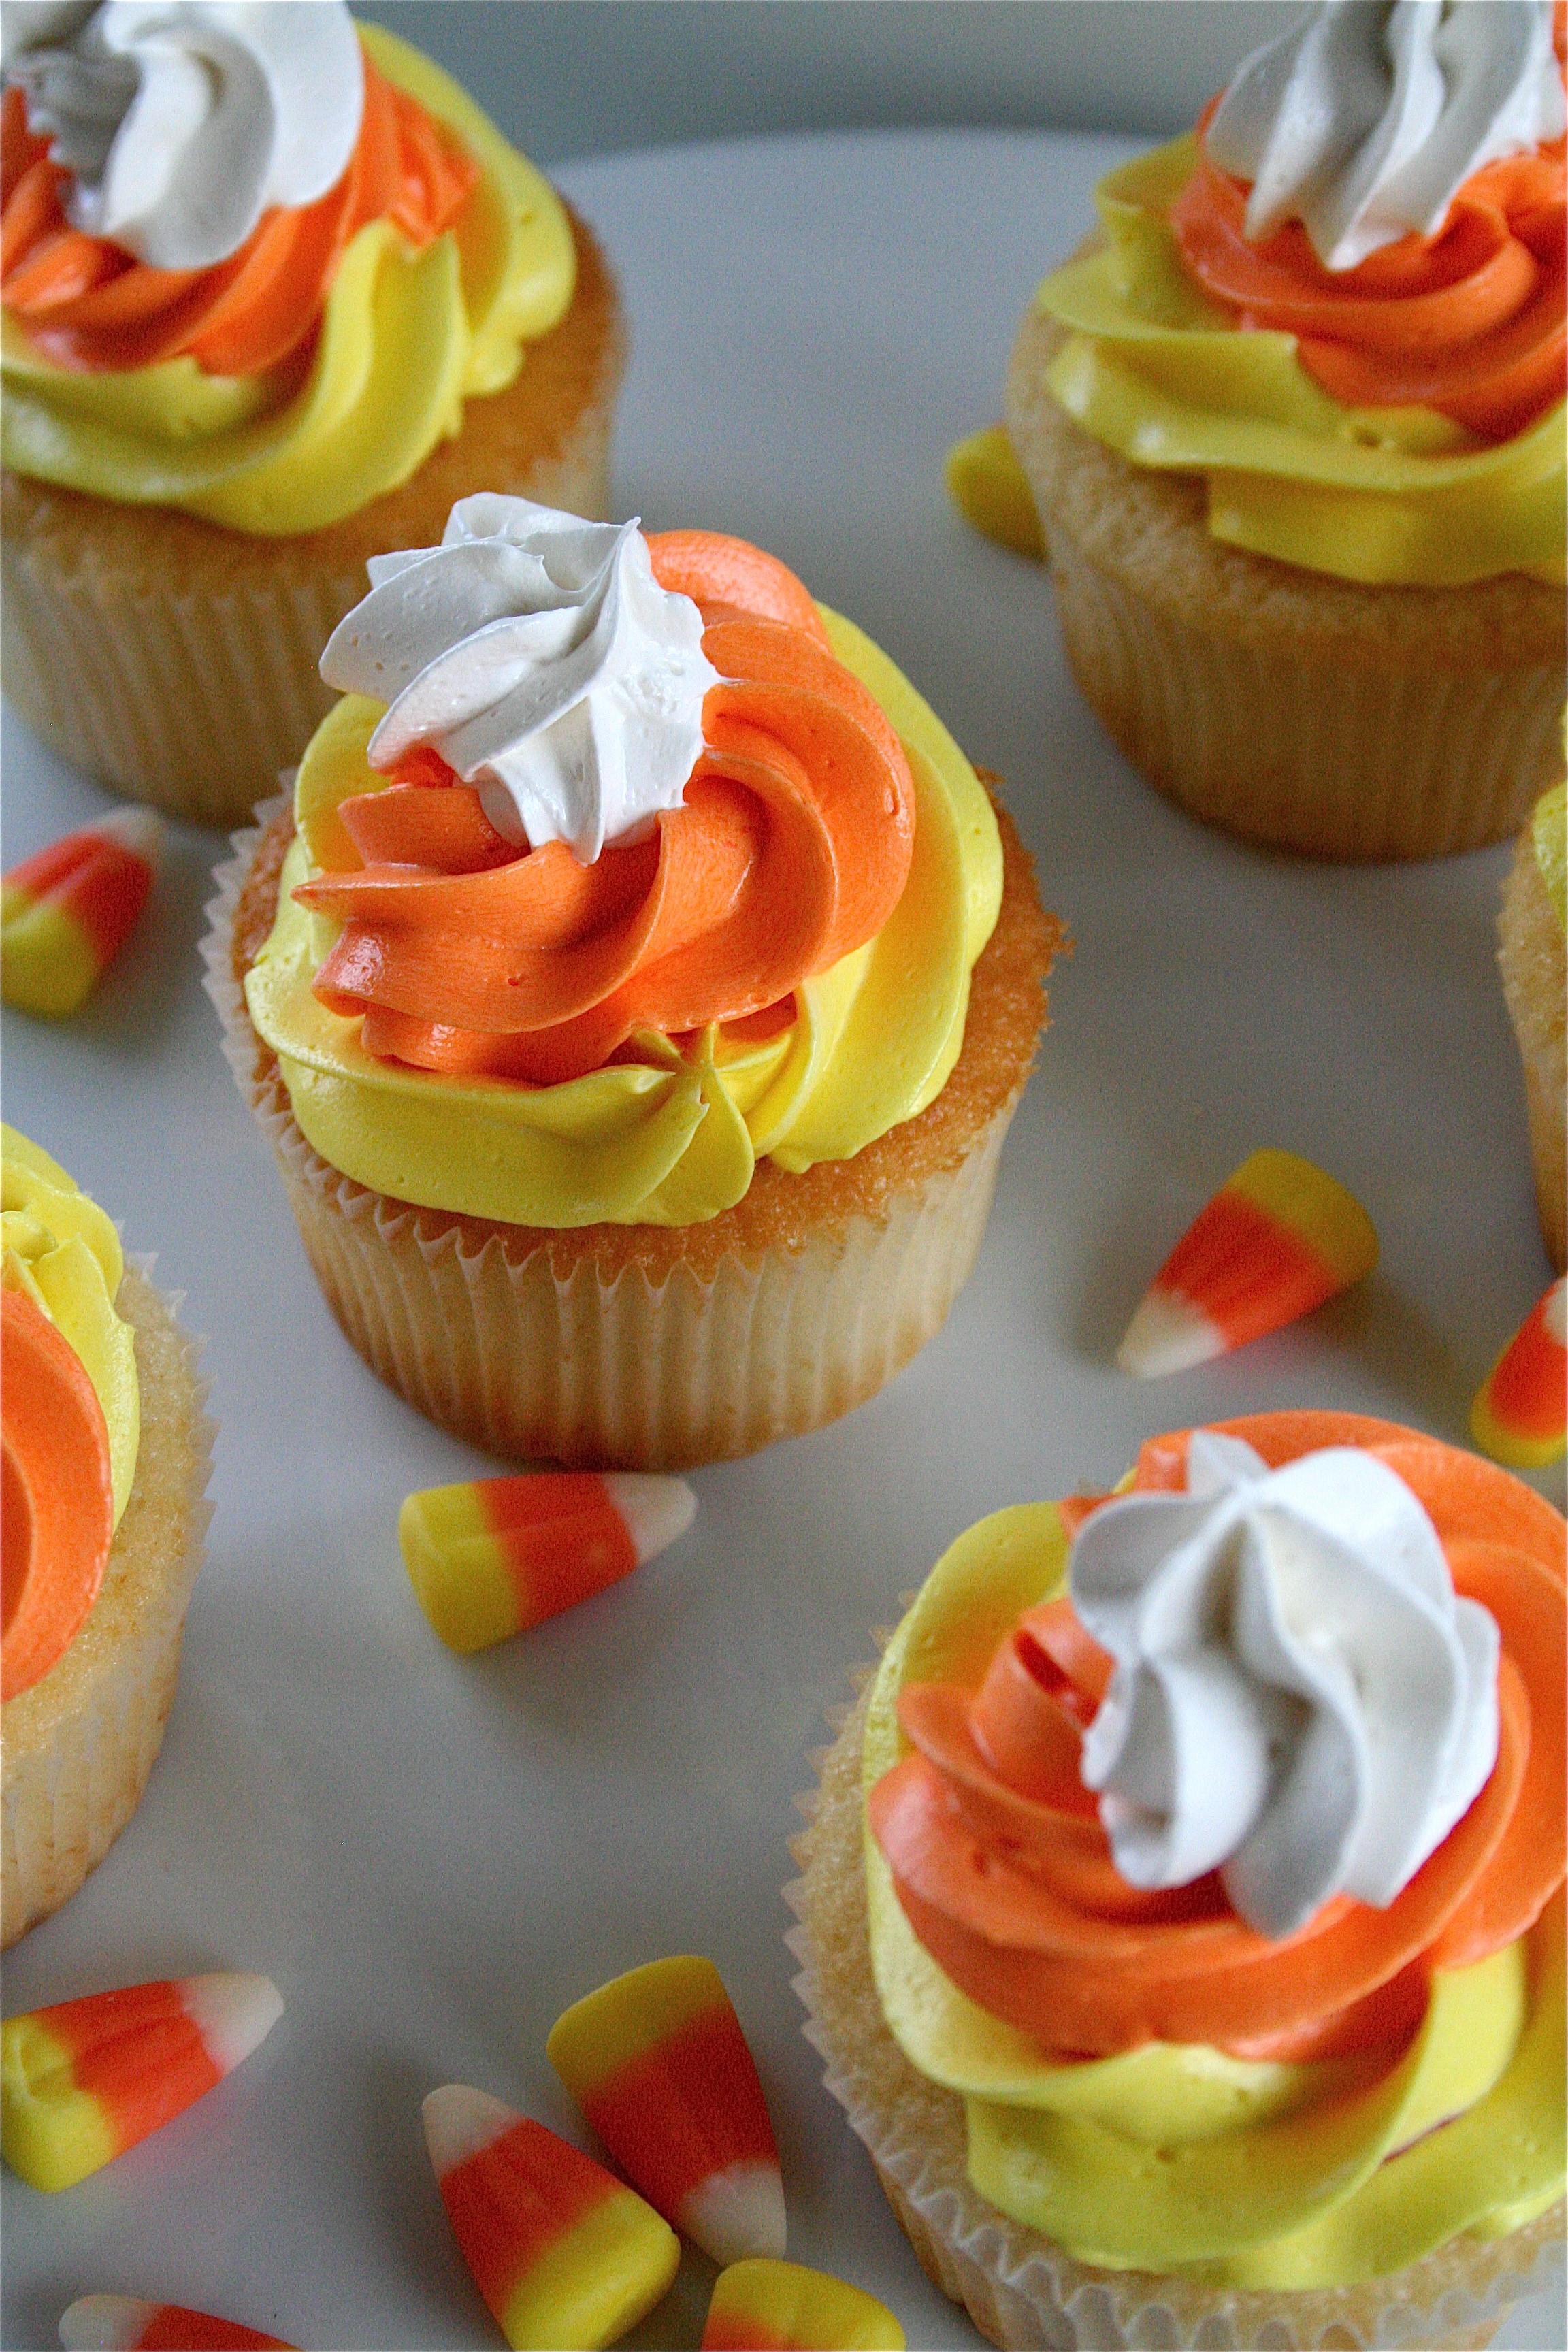 Easy Halloween Cupcakes  28 Cute Halloween Cupcakes Easy Recipes for Halloween